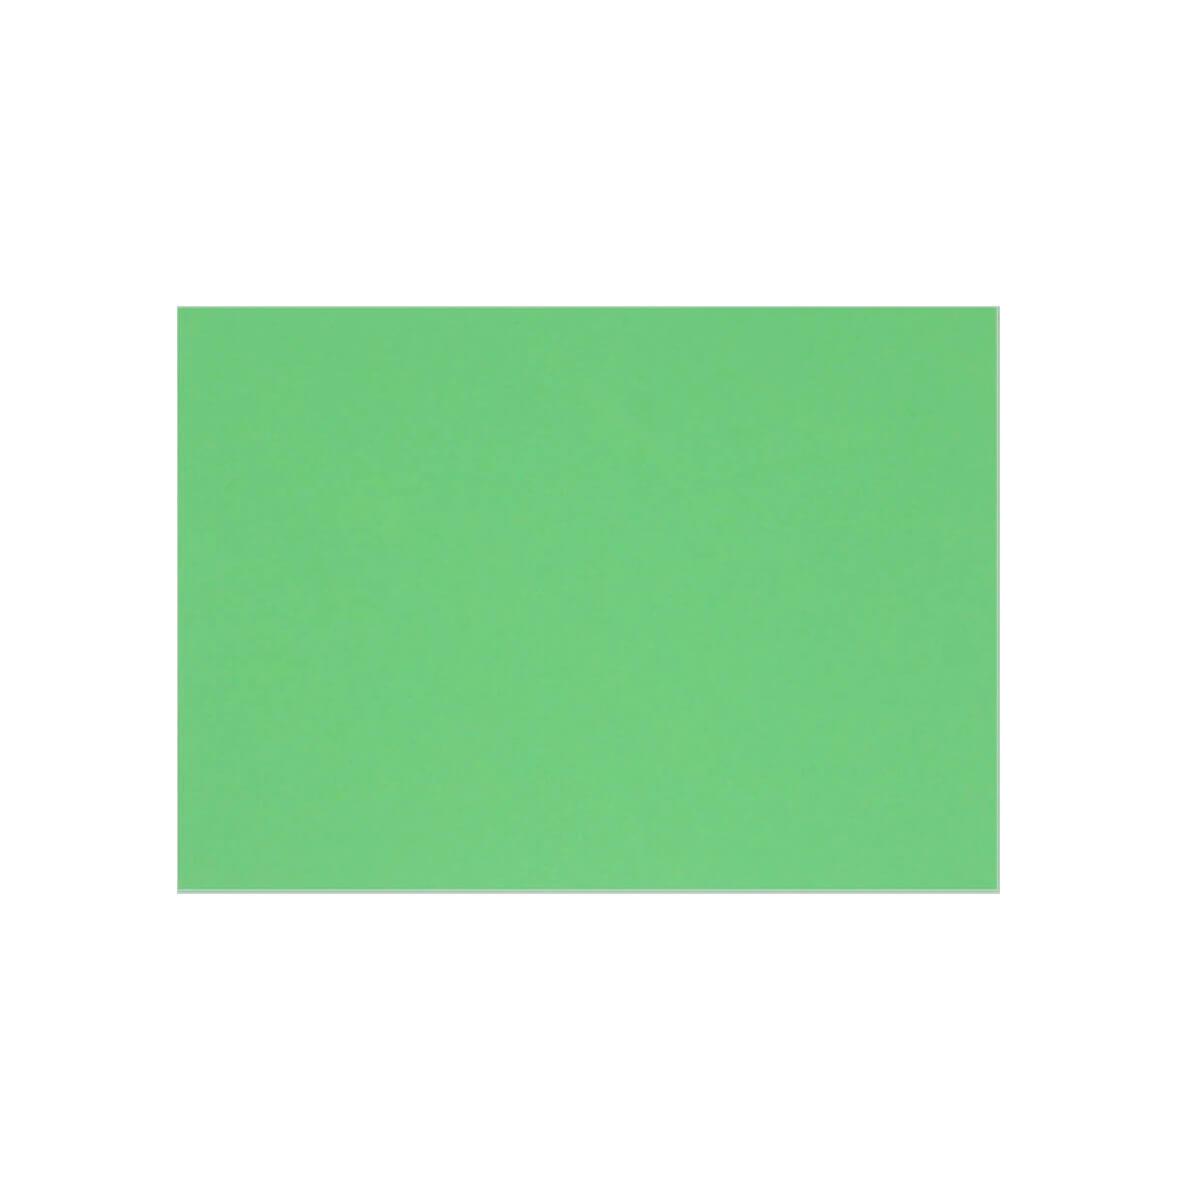 PALE GREEN 125 x 175 mm ENVELOPES 120GSM